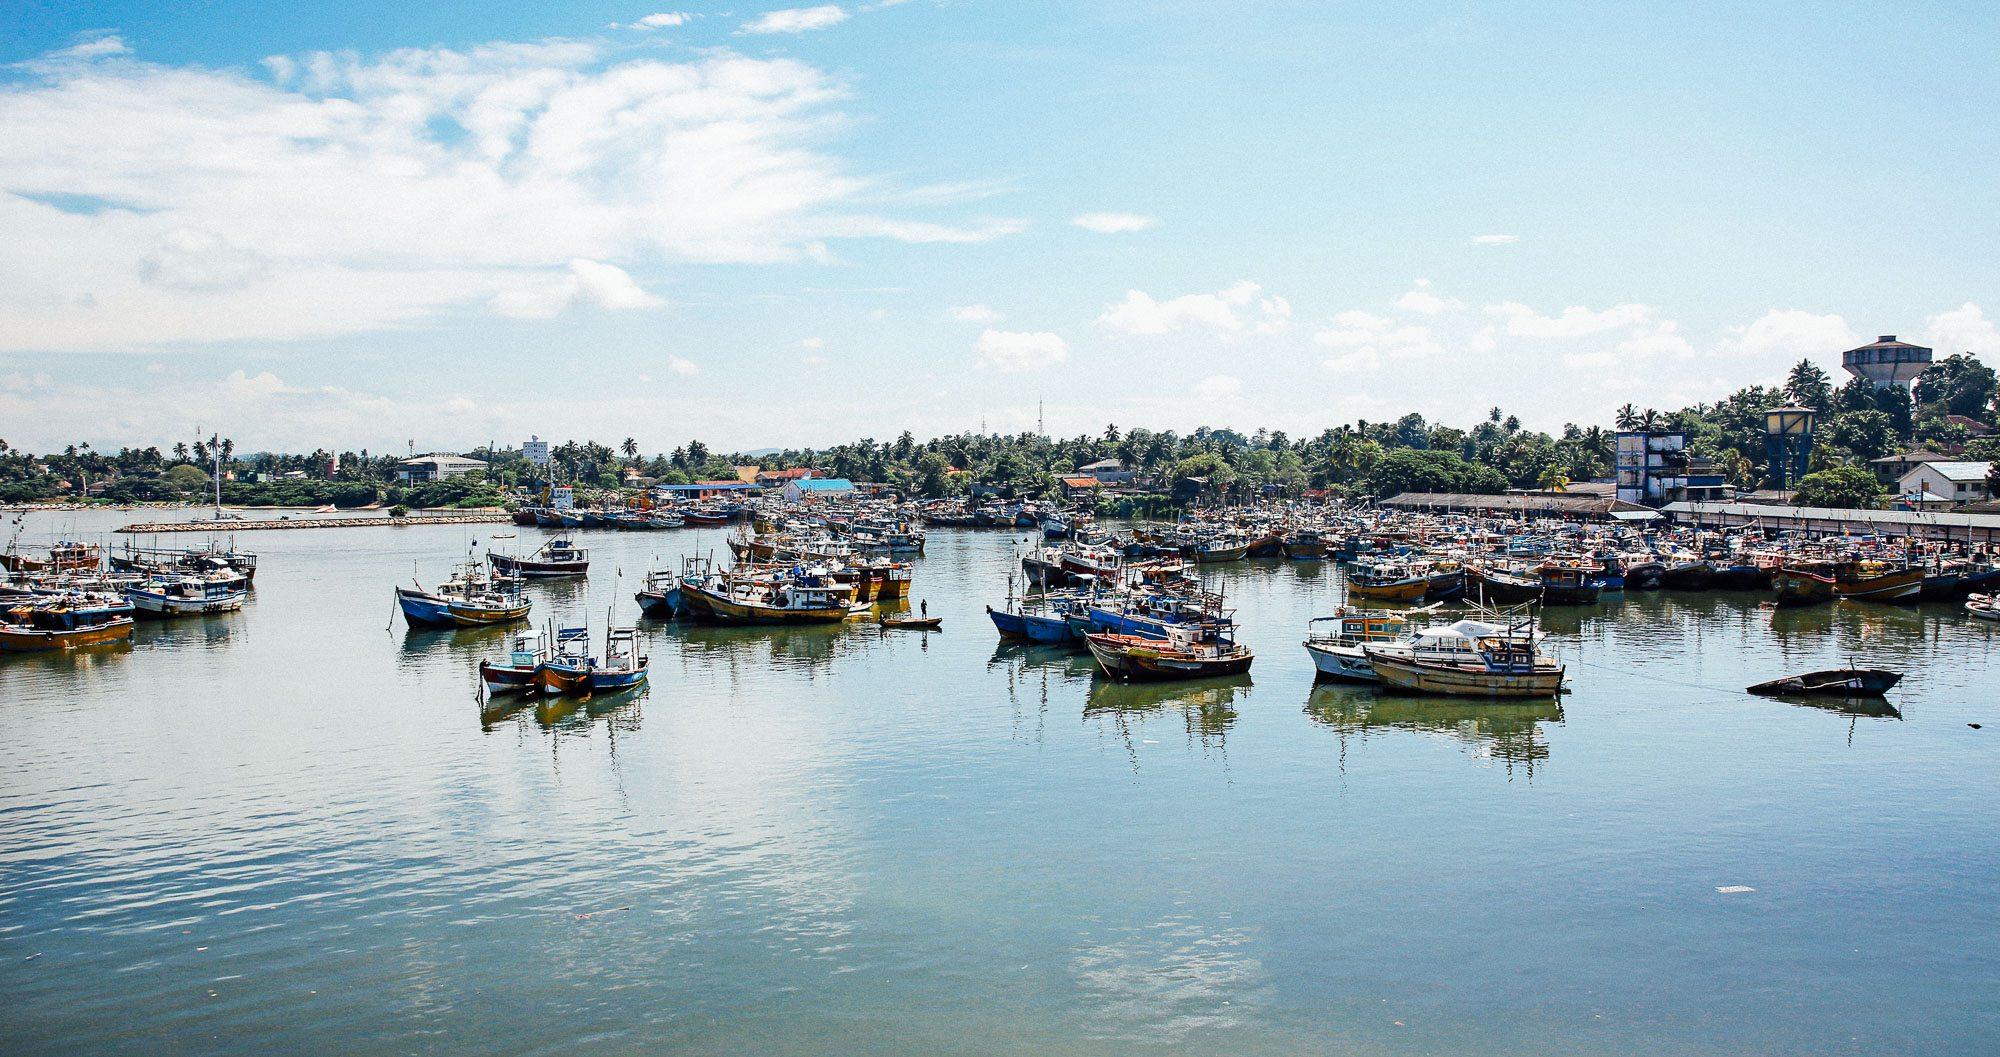 Boats coming in at Beruwala fishing port in Sri Lanka